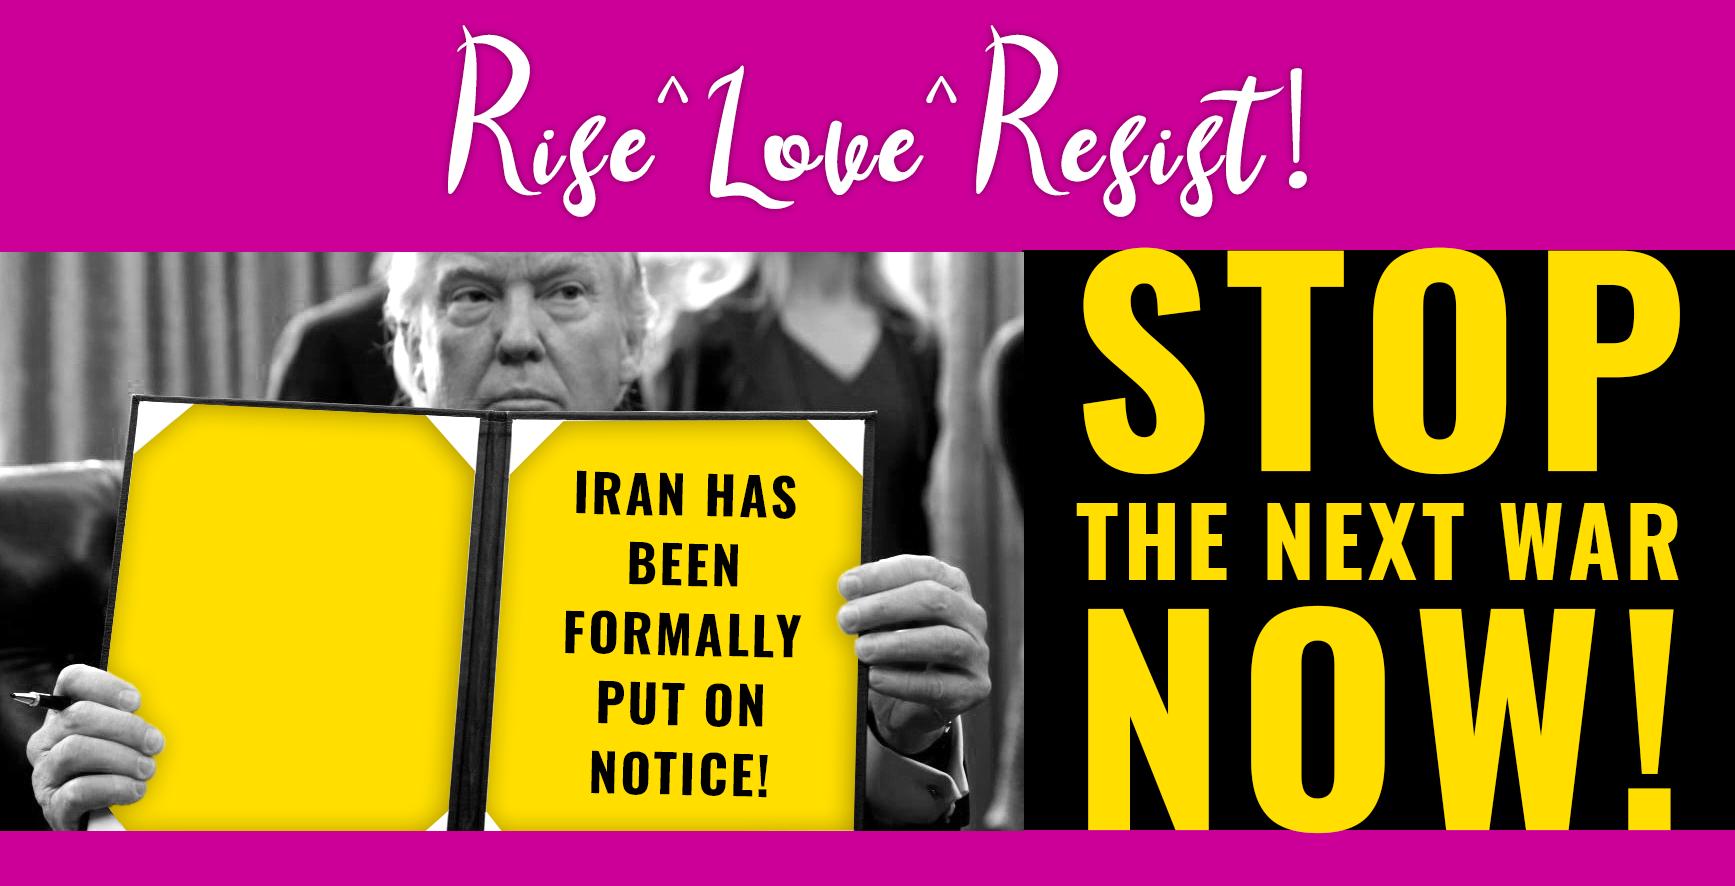 Iran_notice.png